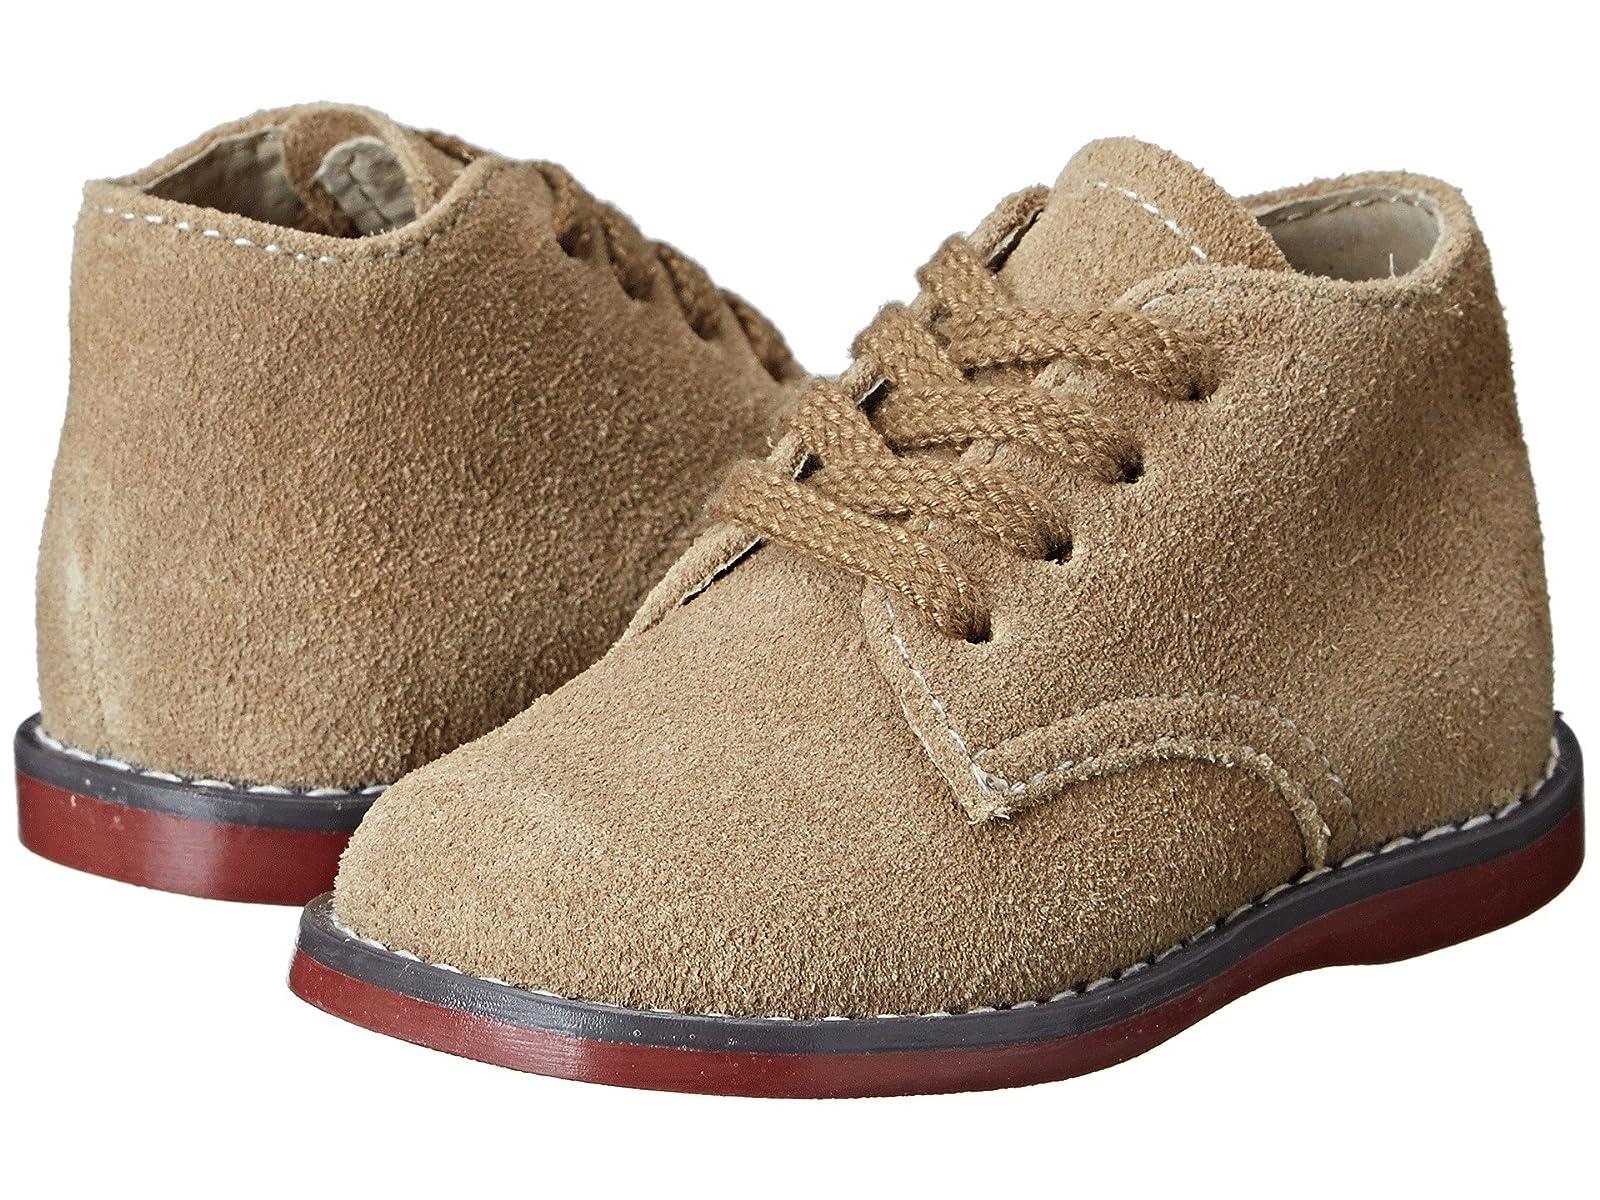 FootMates Todd 3 (Infant/Toddler)Affordable and distinctive shoes